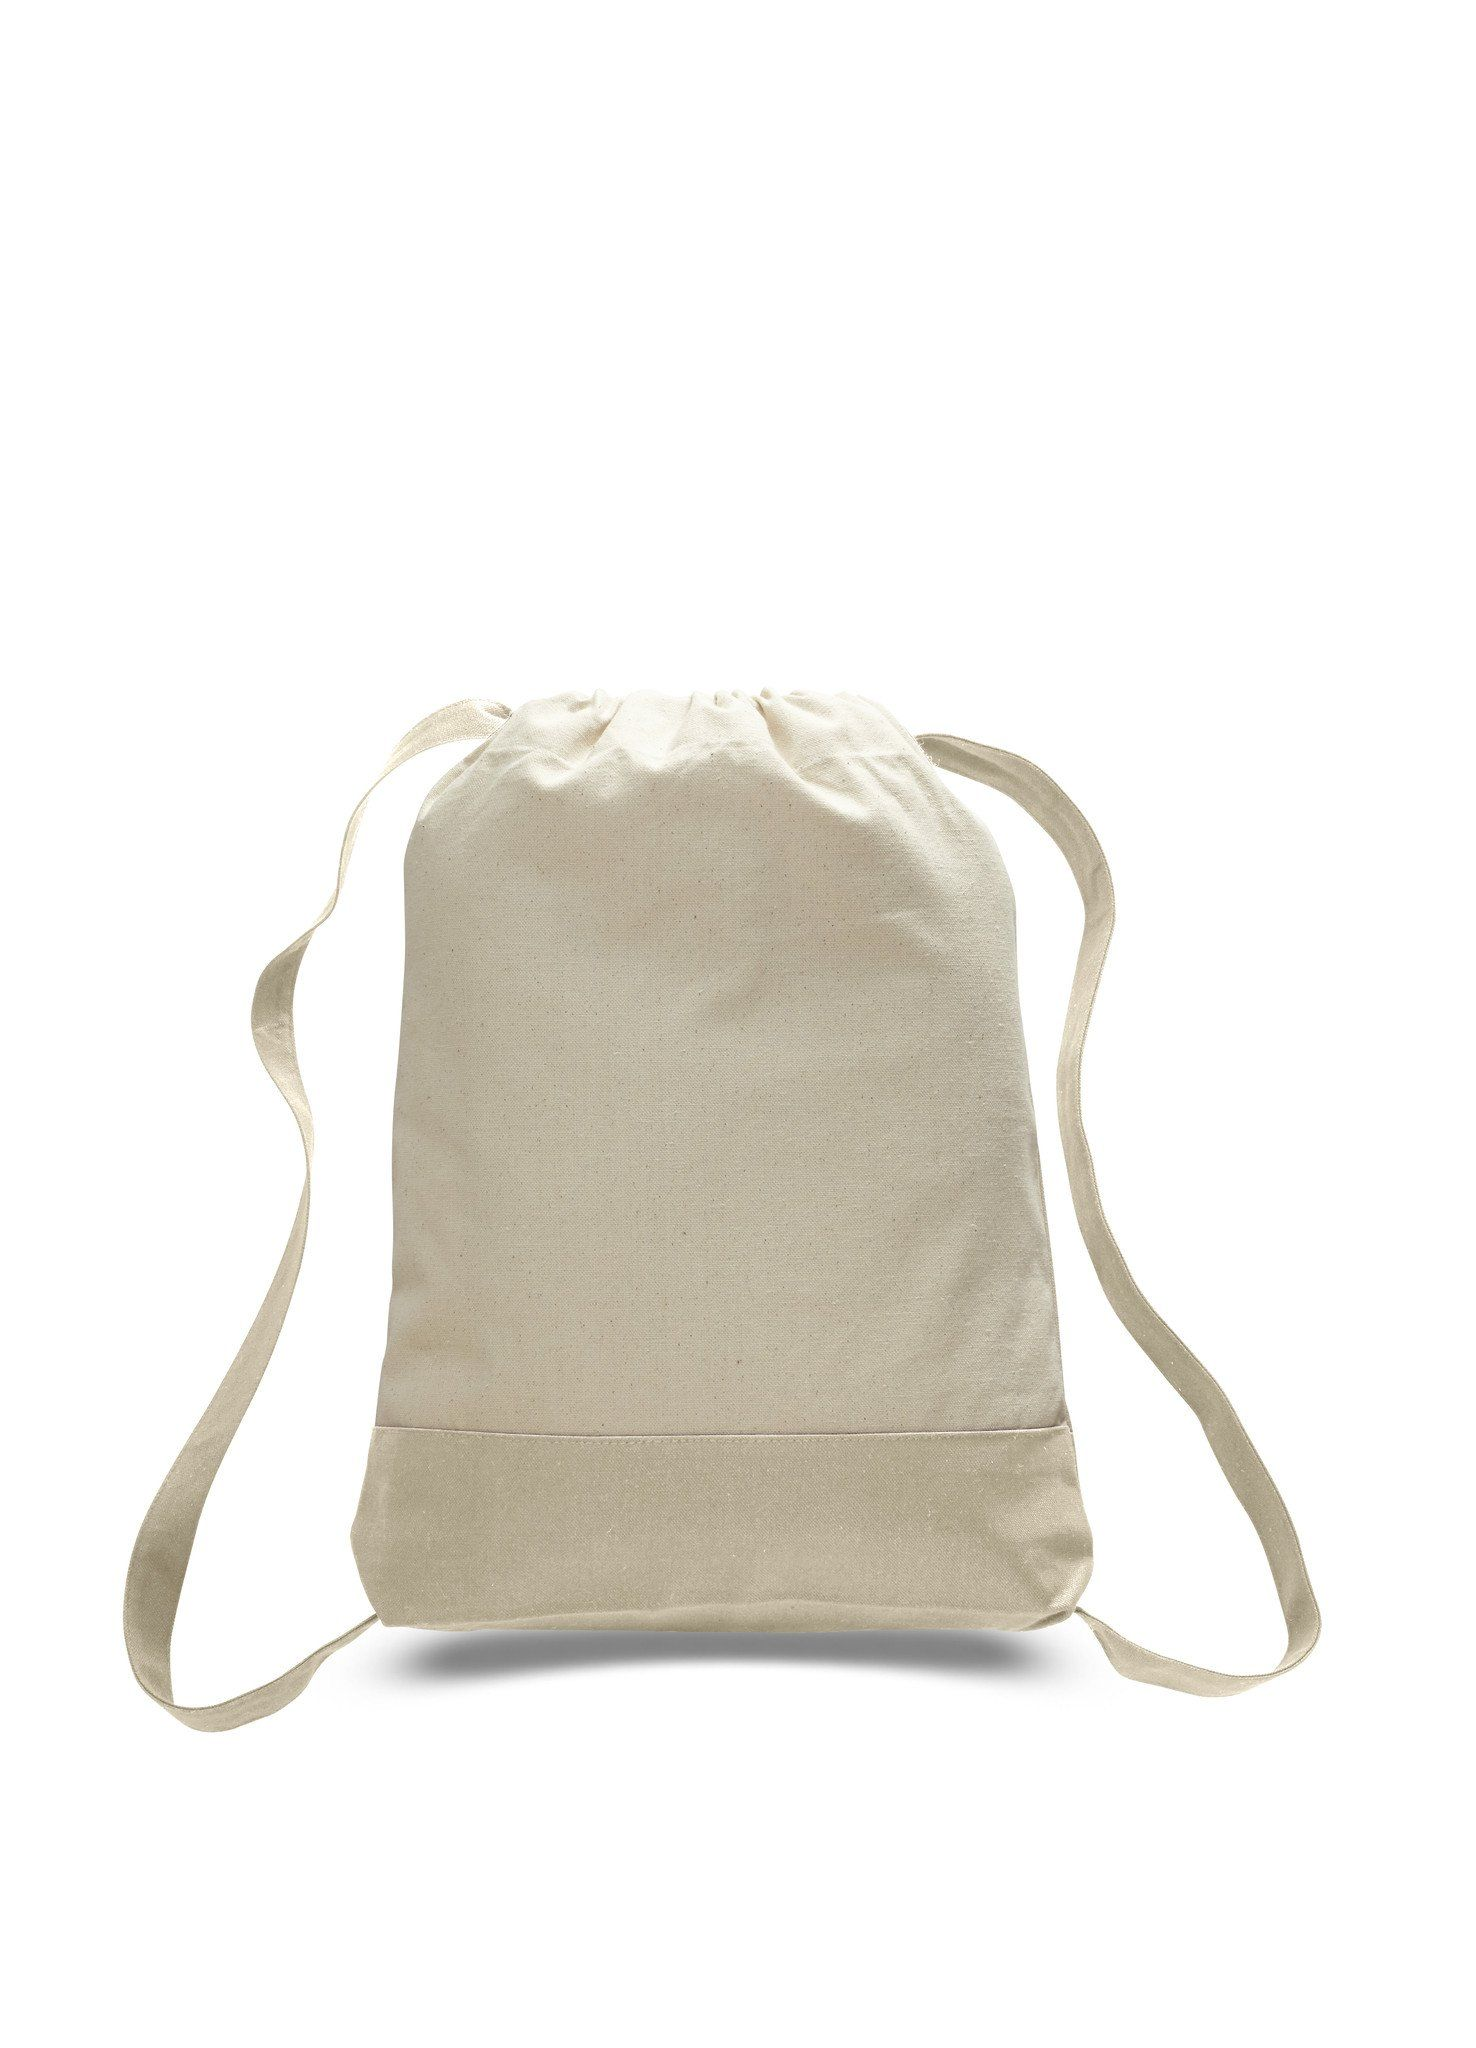 47c81cf91b High Quality Heavy Canvas Durable Gym Drawstring Backpack - BPK57